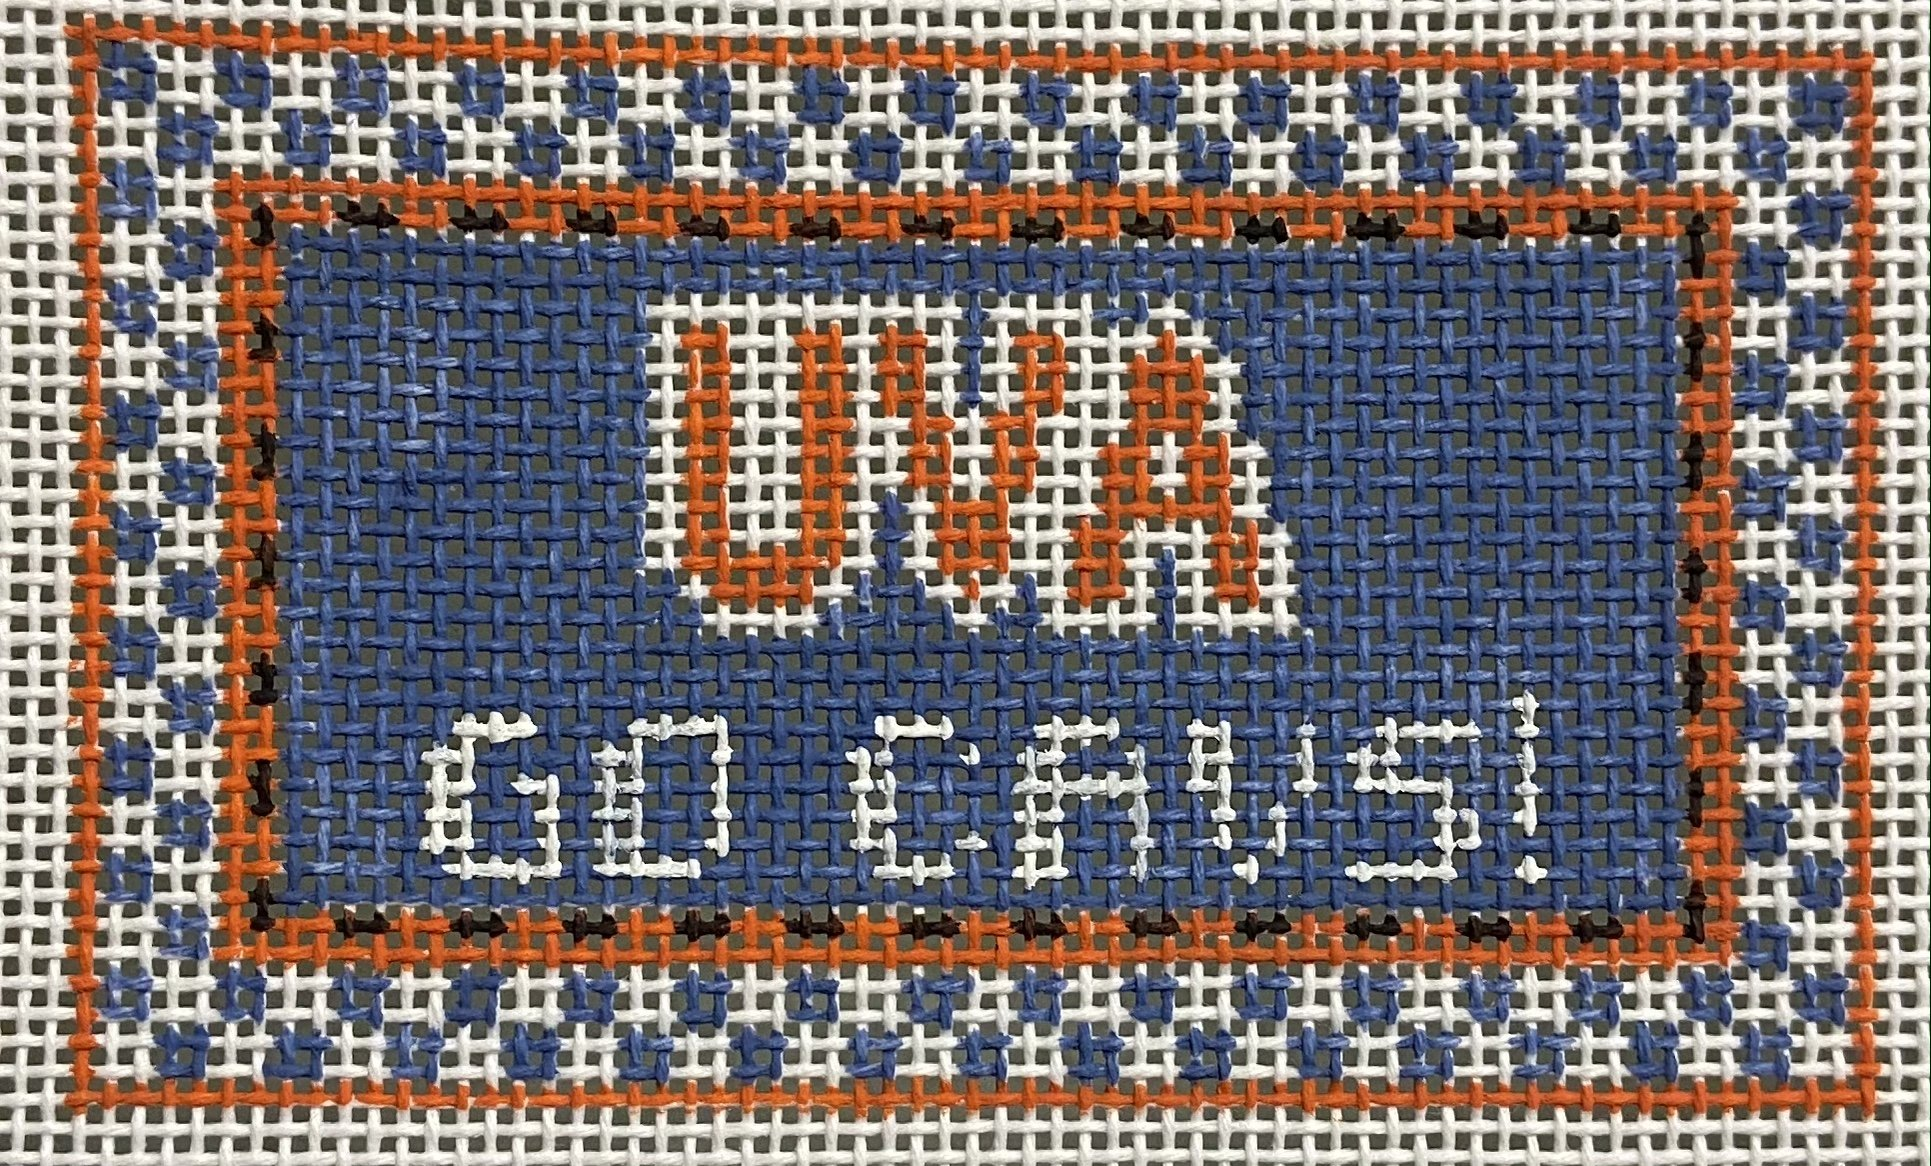 UVA Go Cavs!